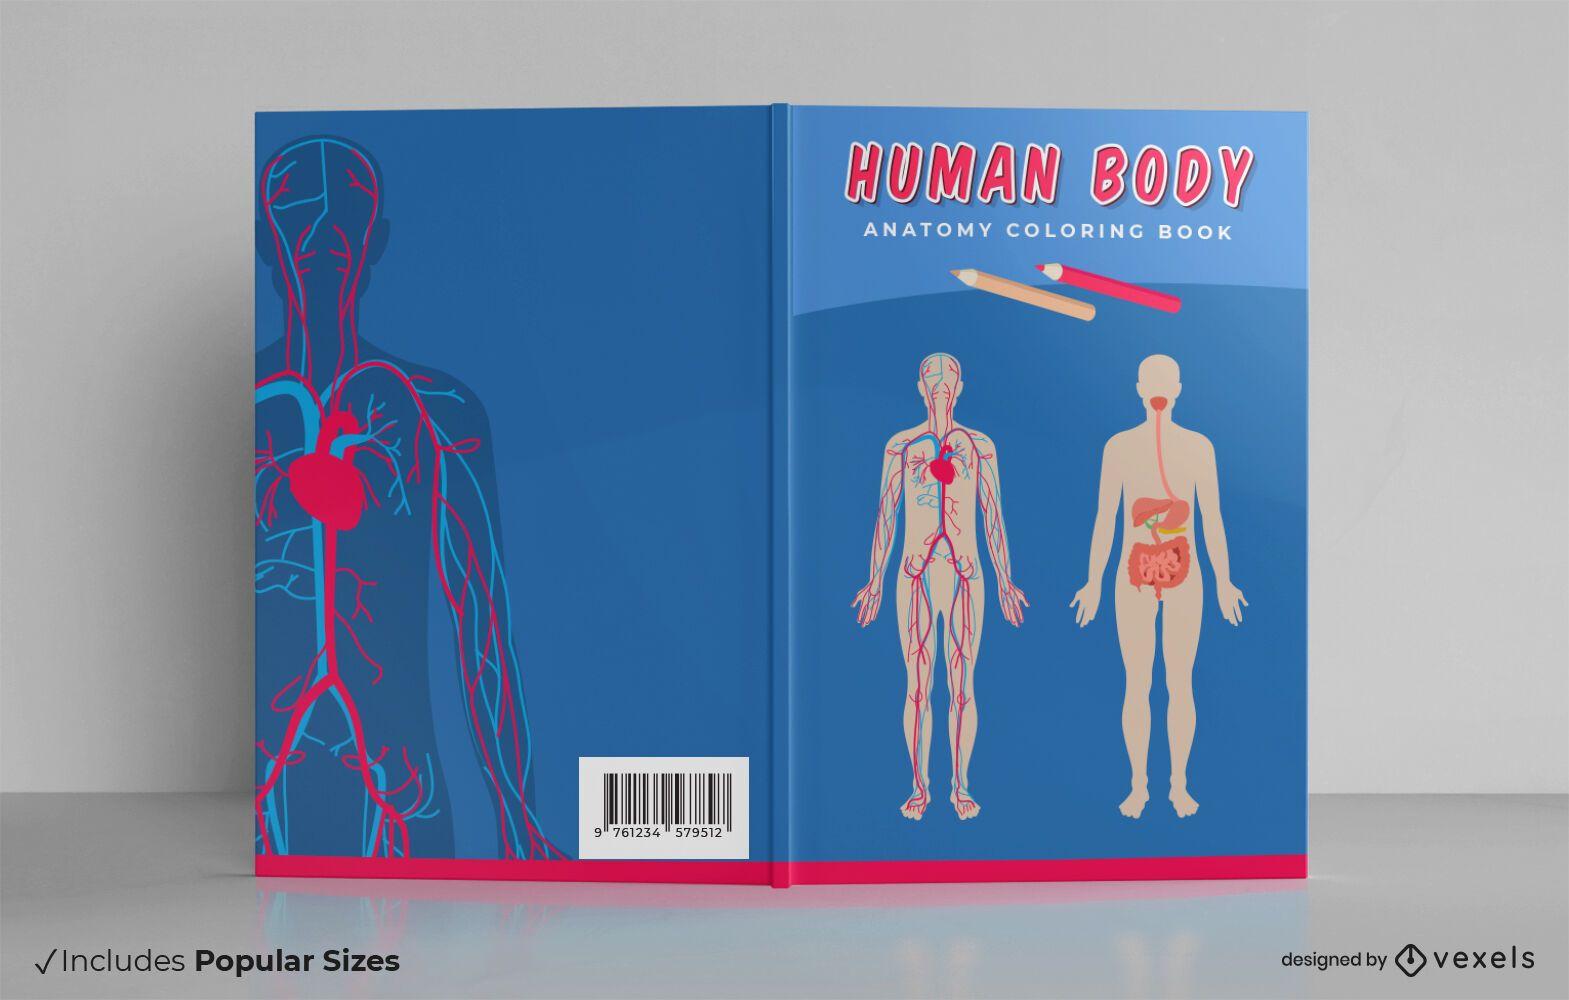 Human body book cover design